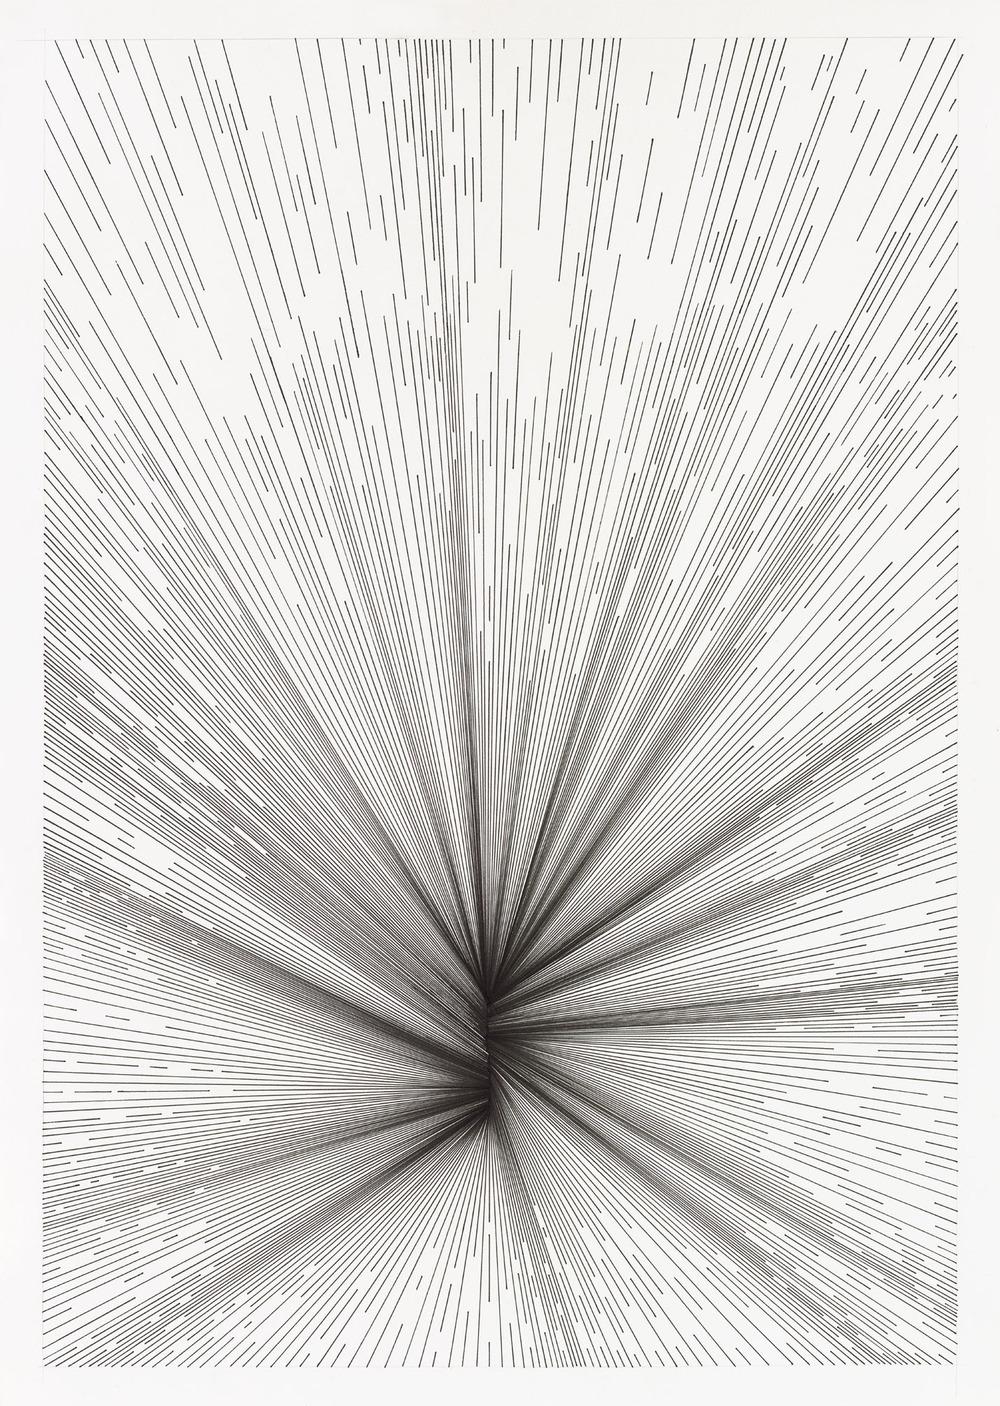 BK P18209 | untitled | pigment liner on paper | 59x42cm | 2016